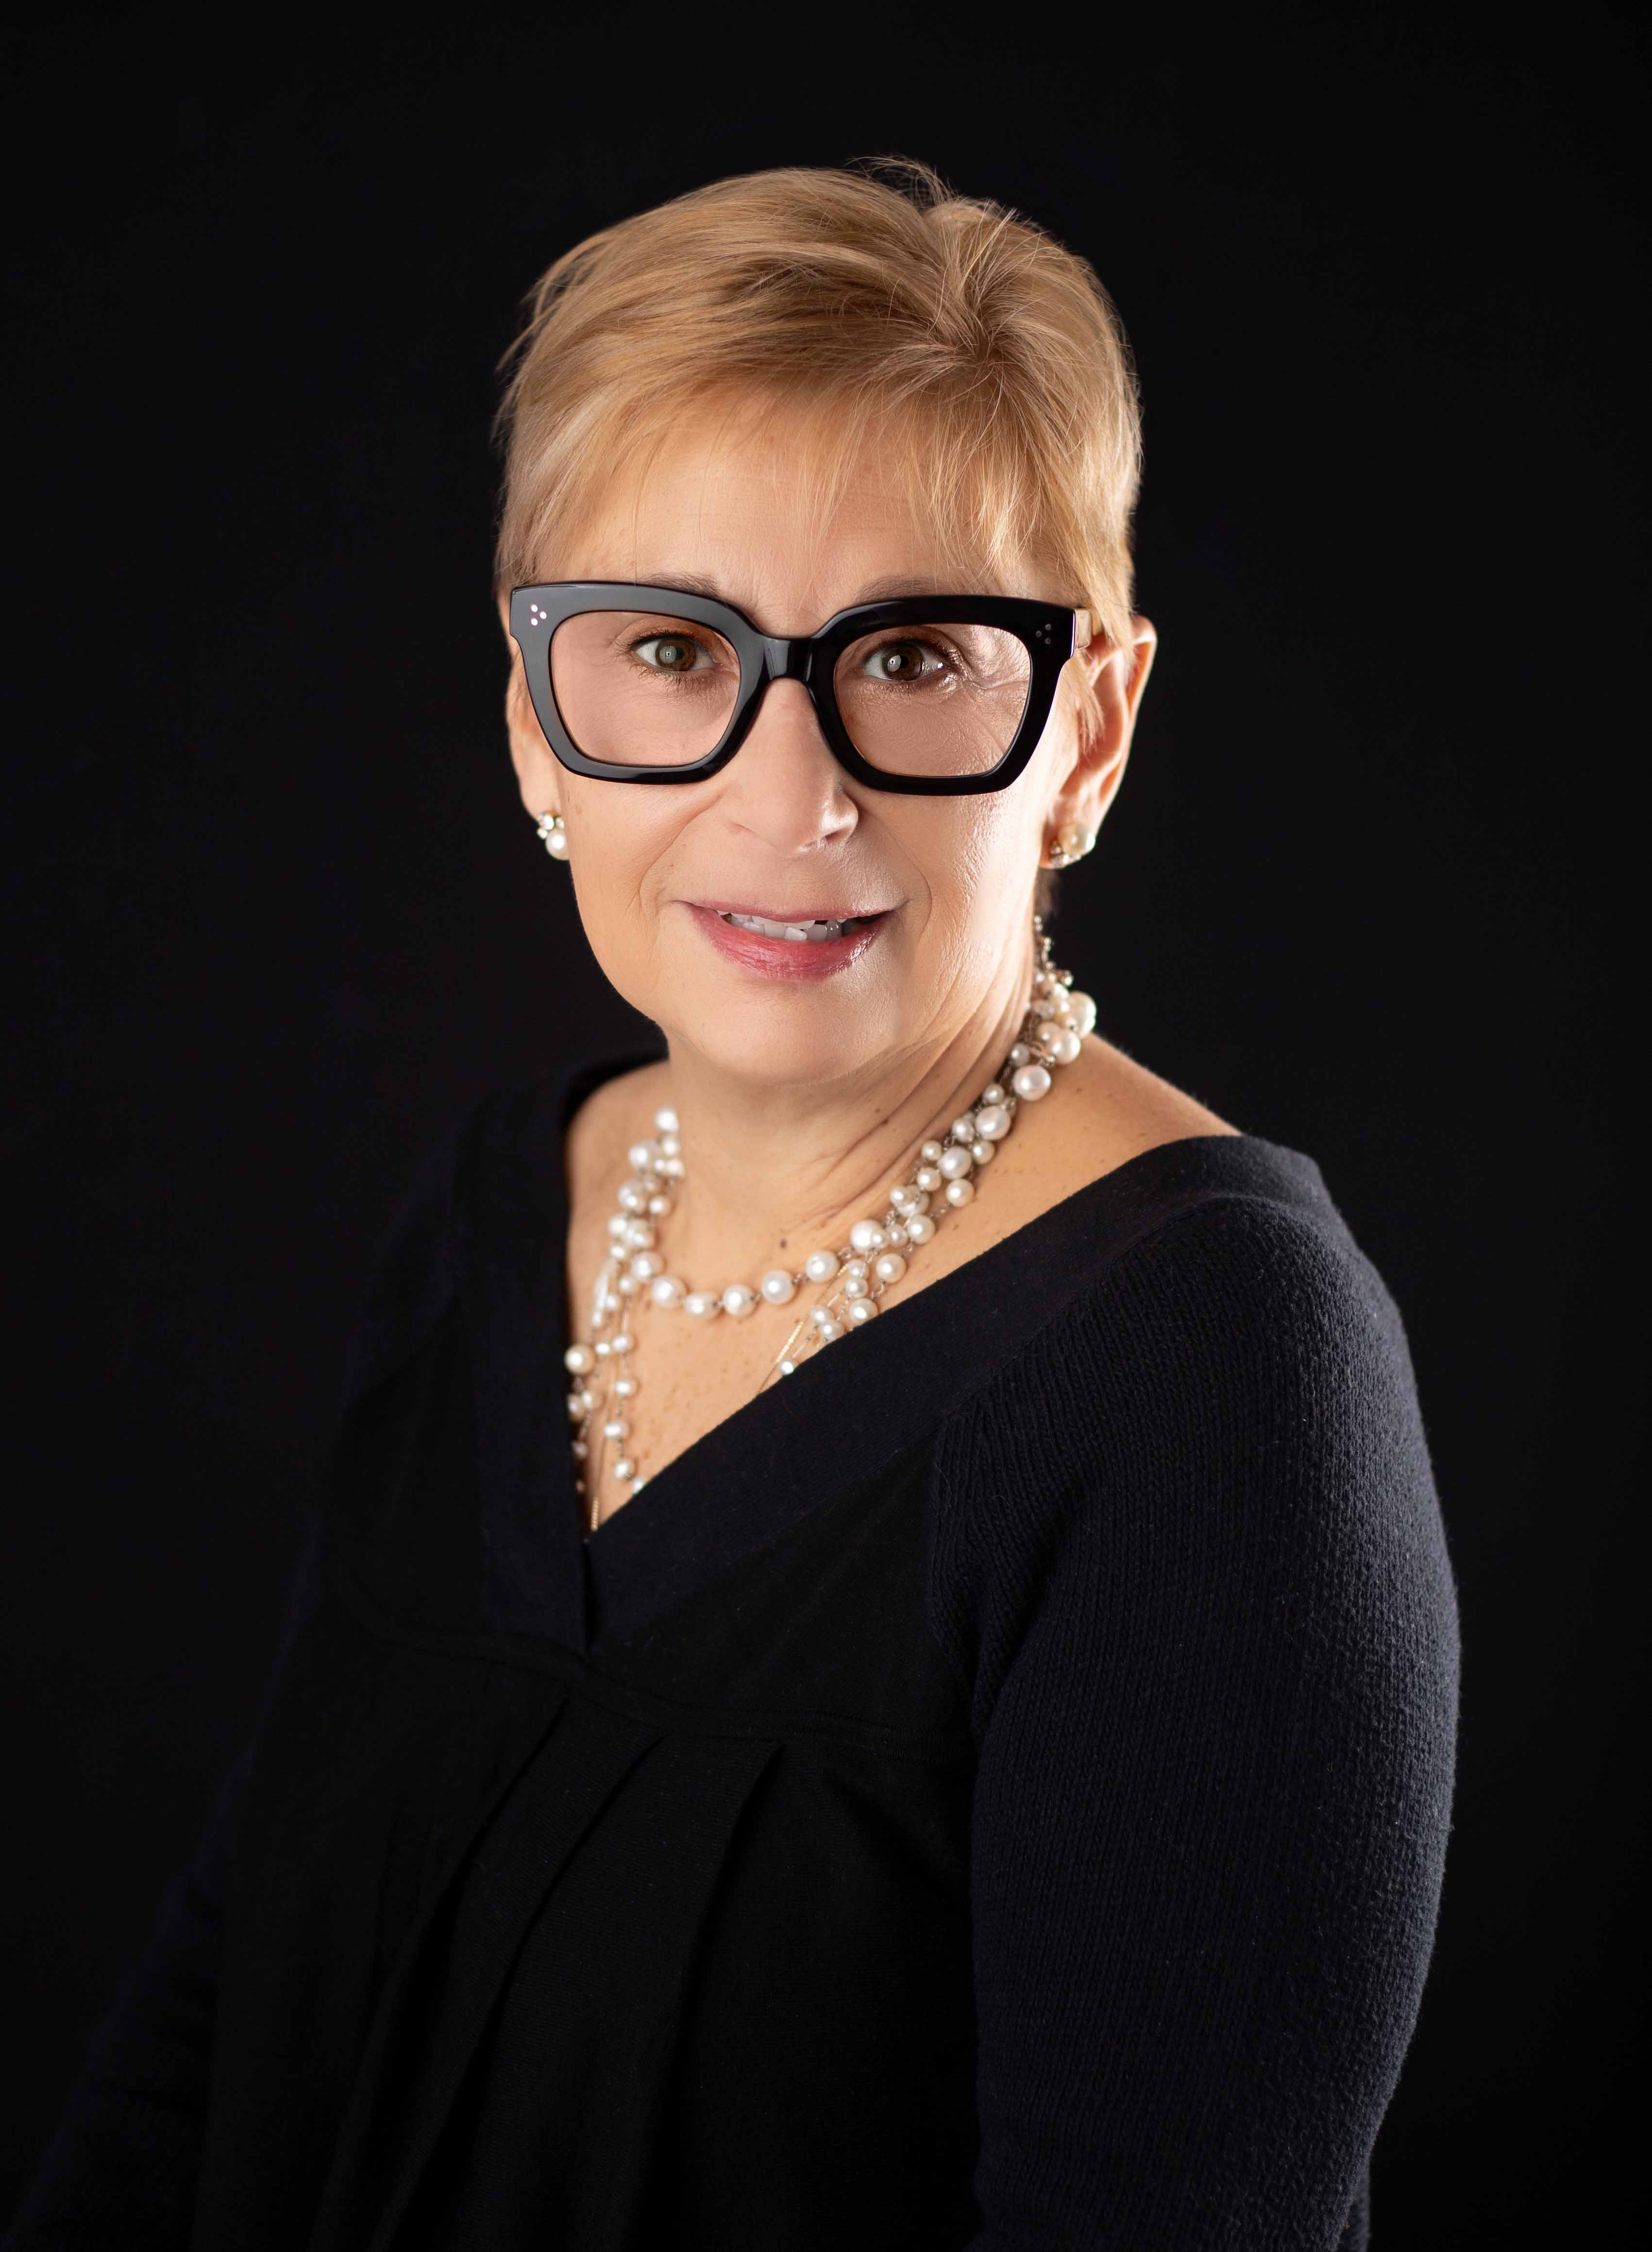 MARY ANN SALEFSKI